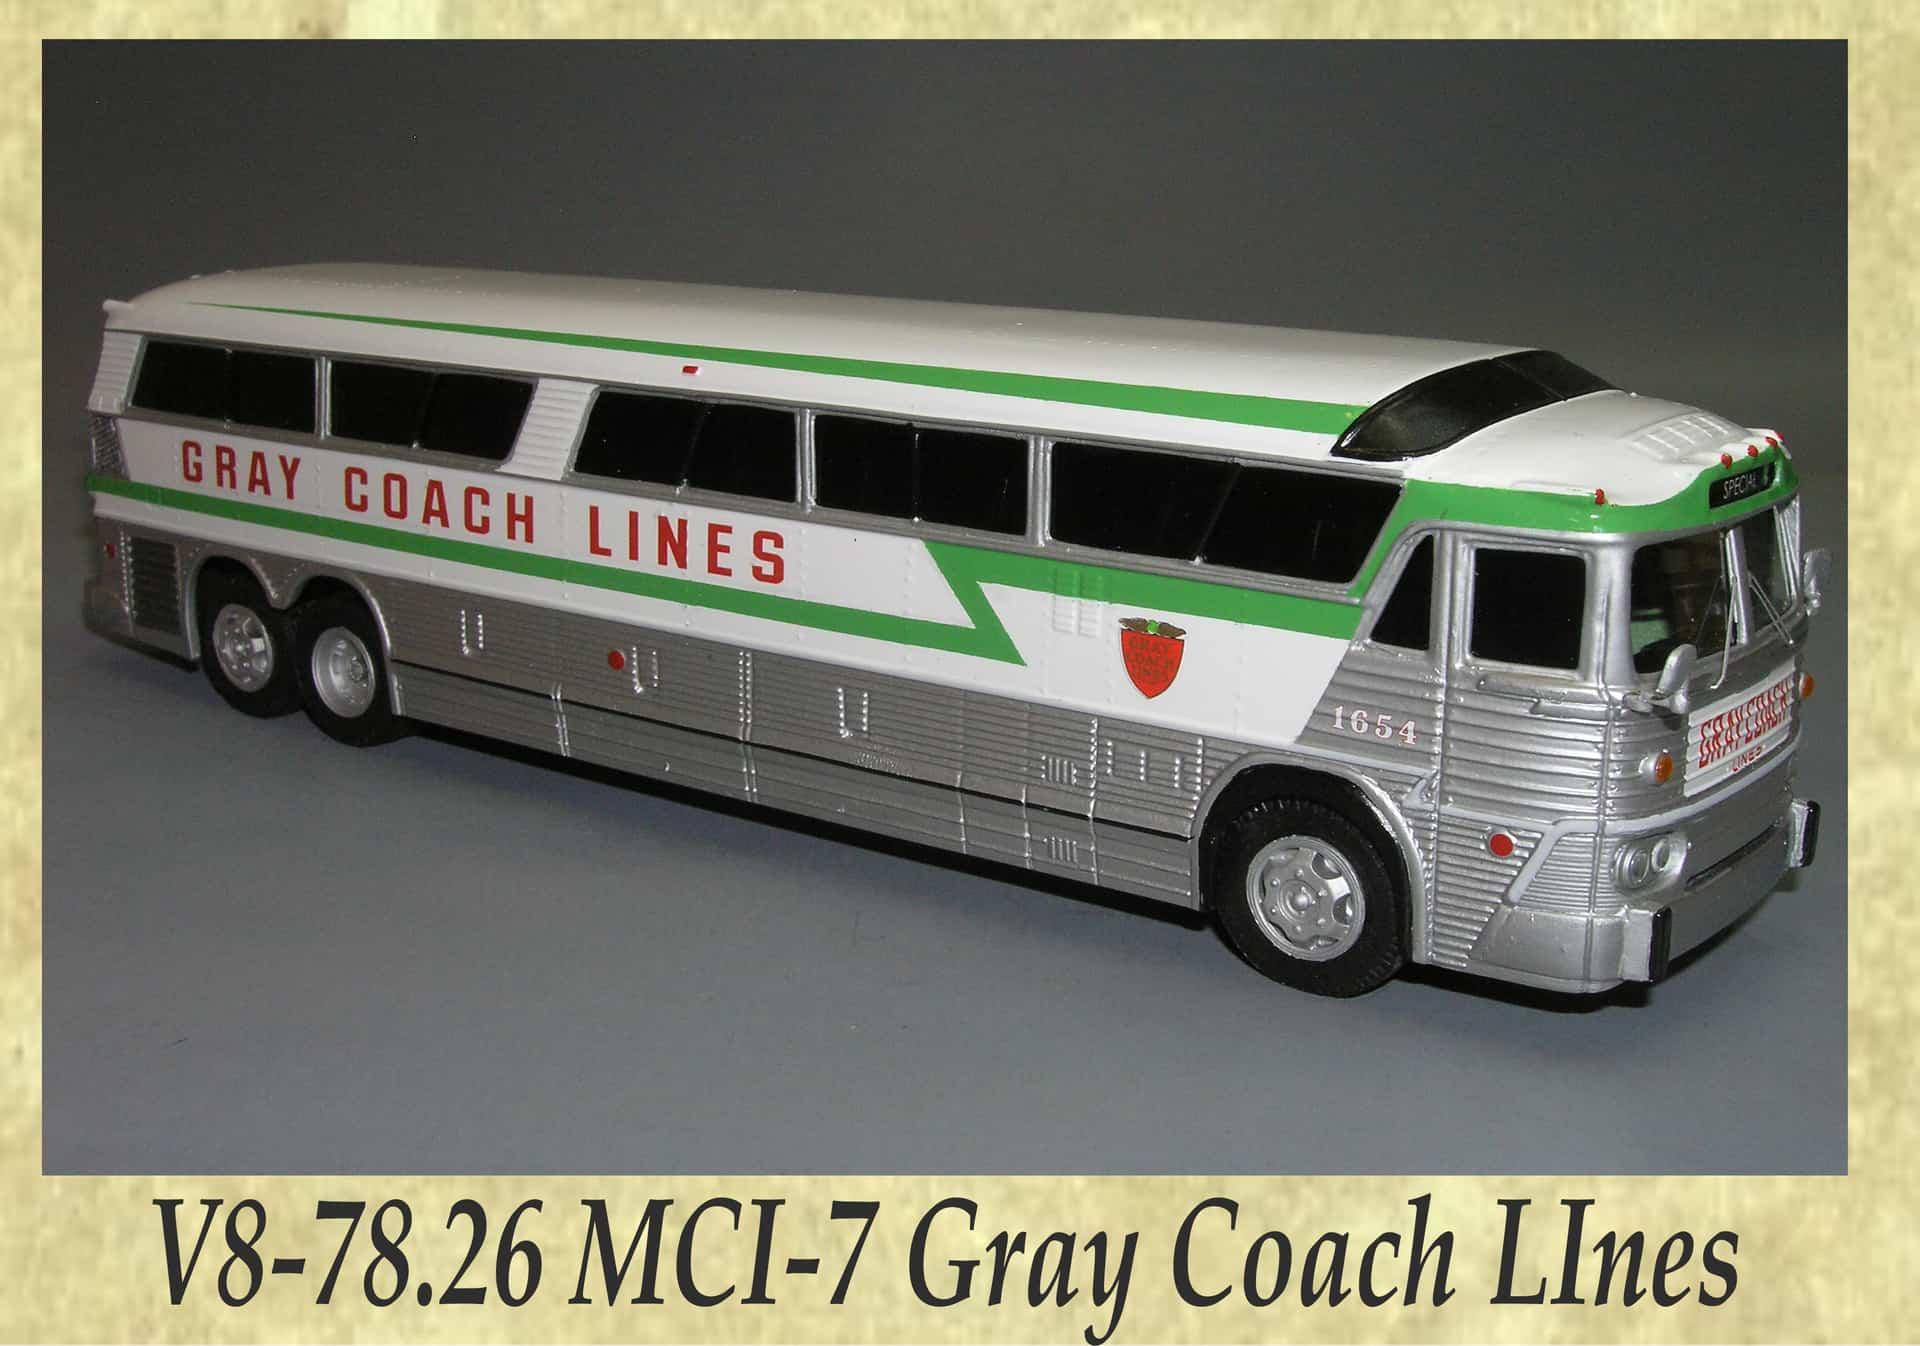 V8-78.26 MCI-7 Gray Coach LInes